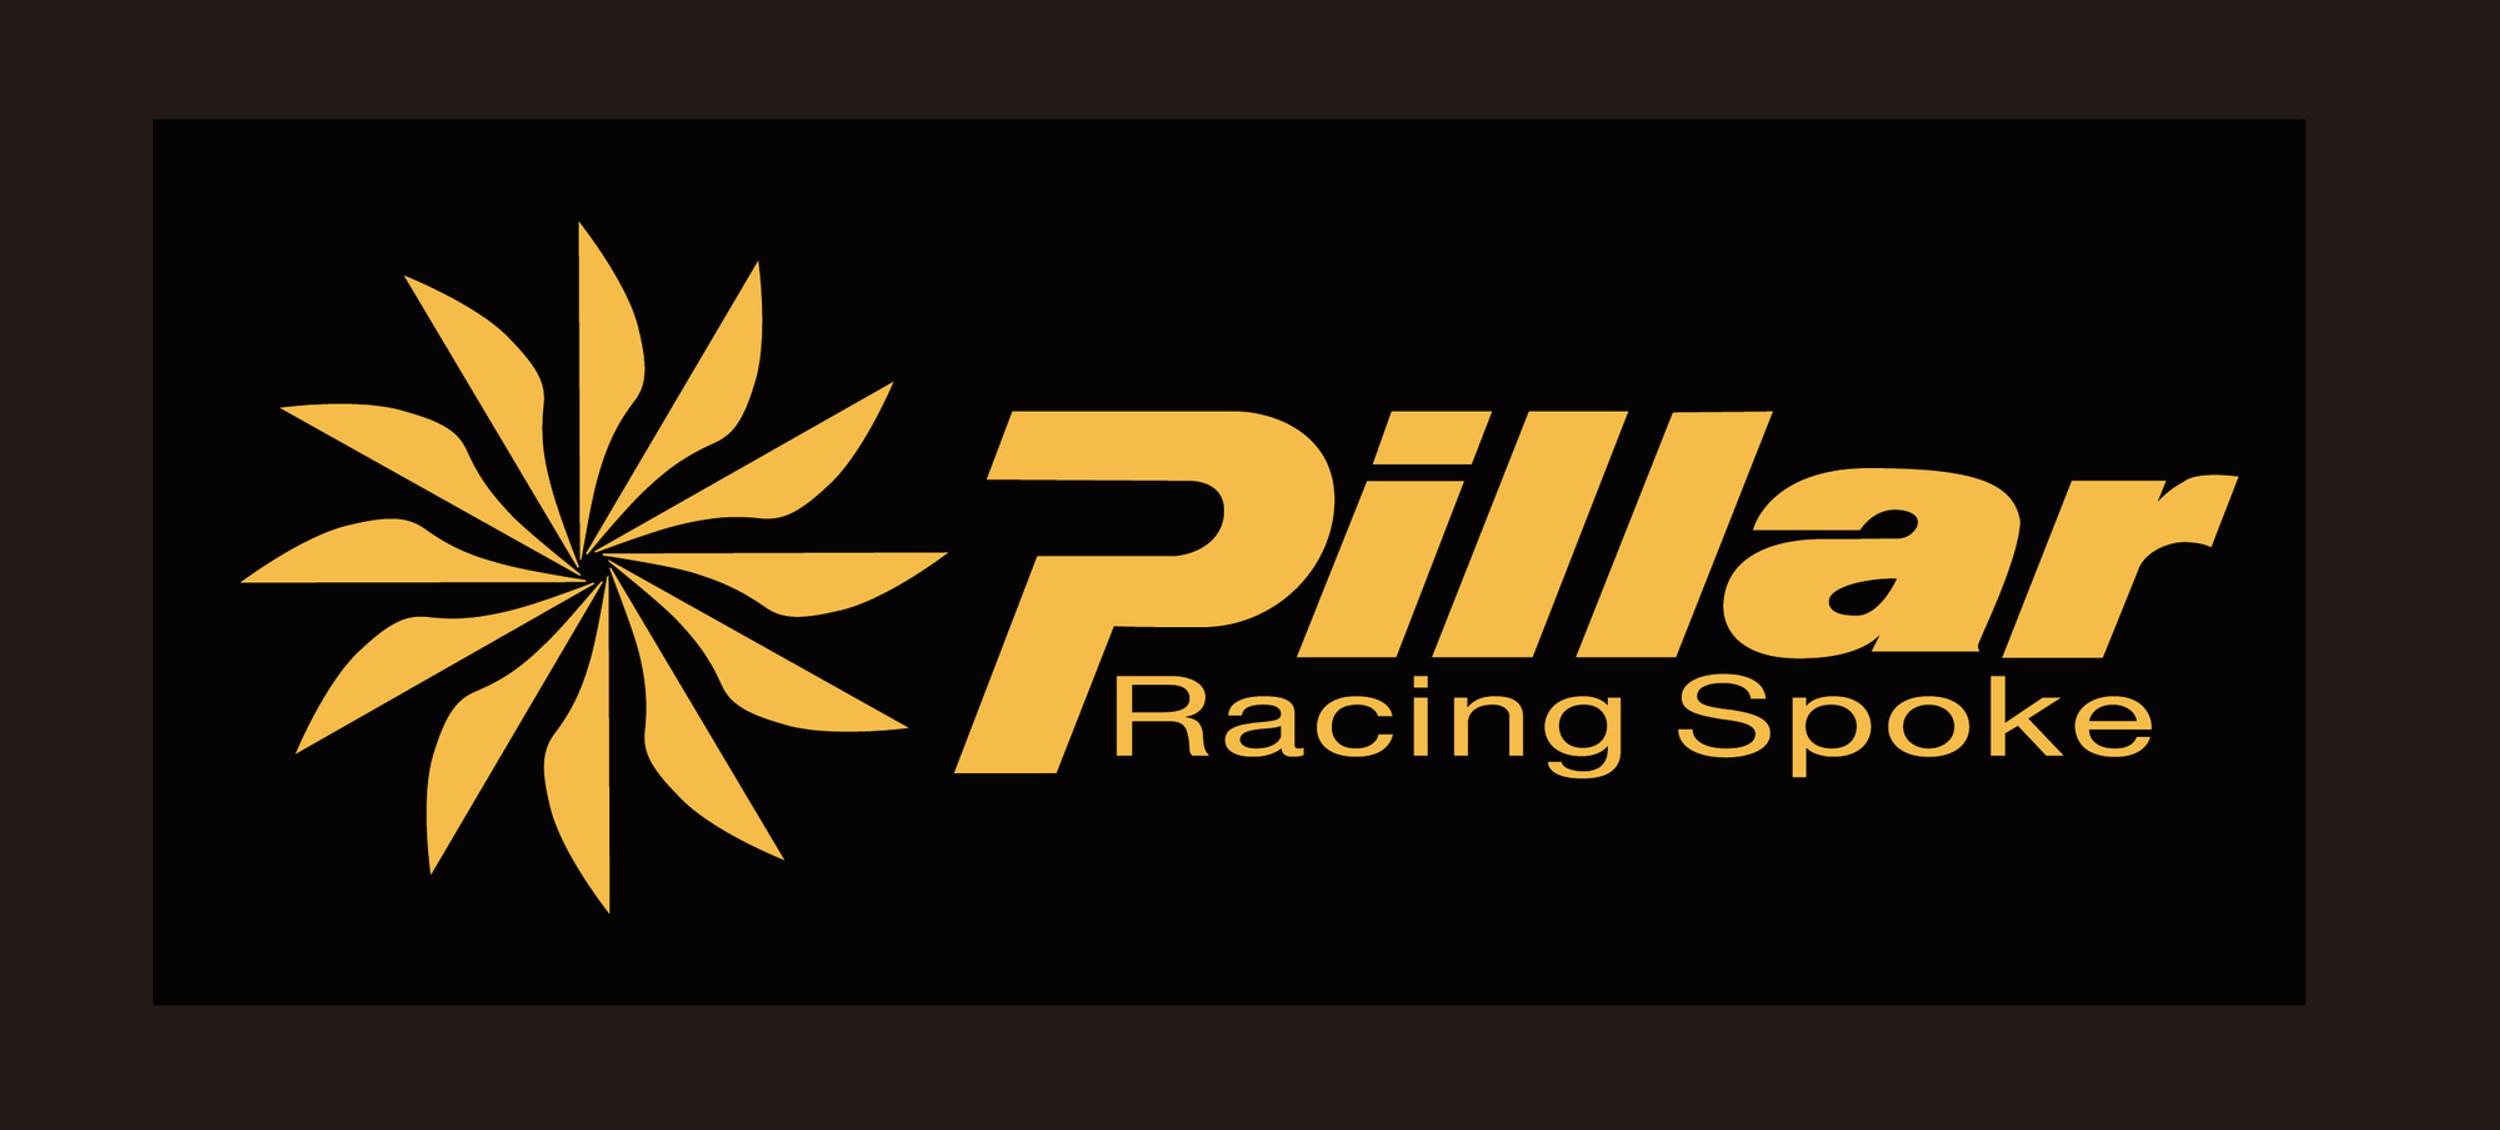 www.pillarspoke.com